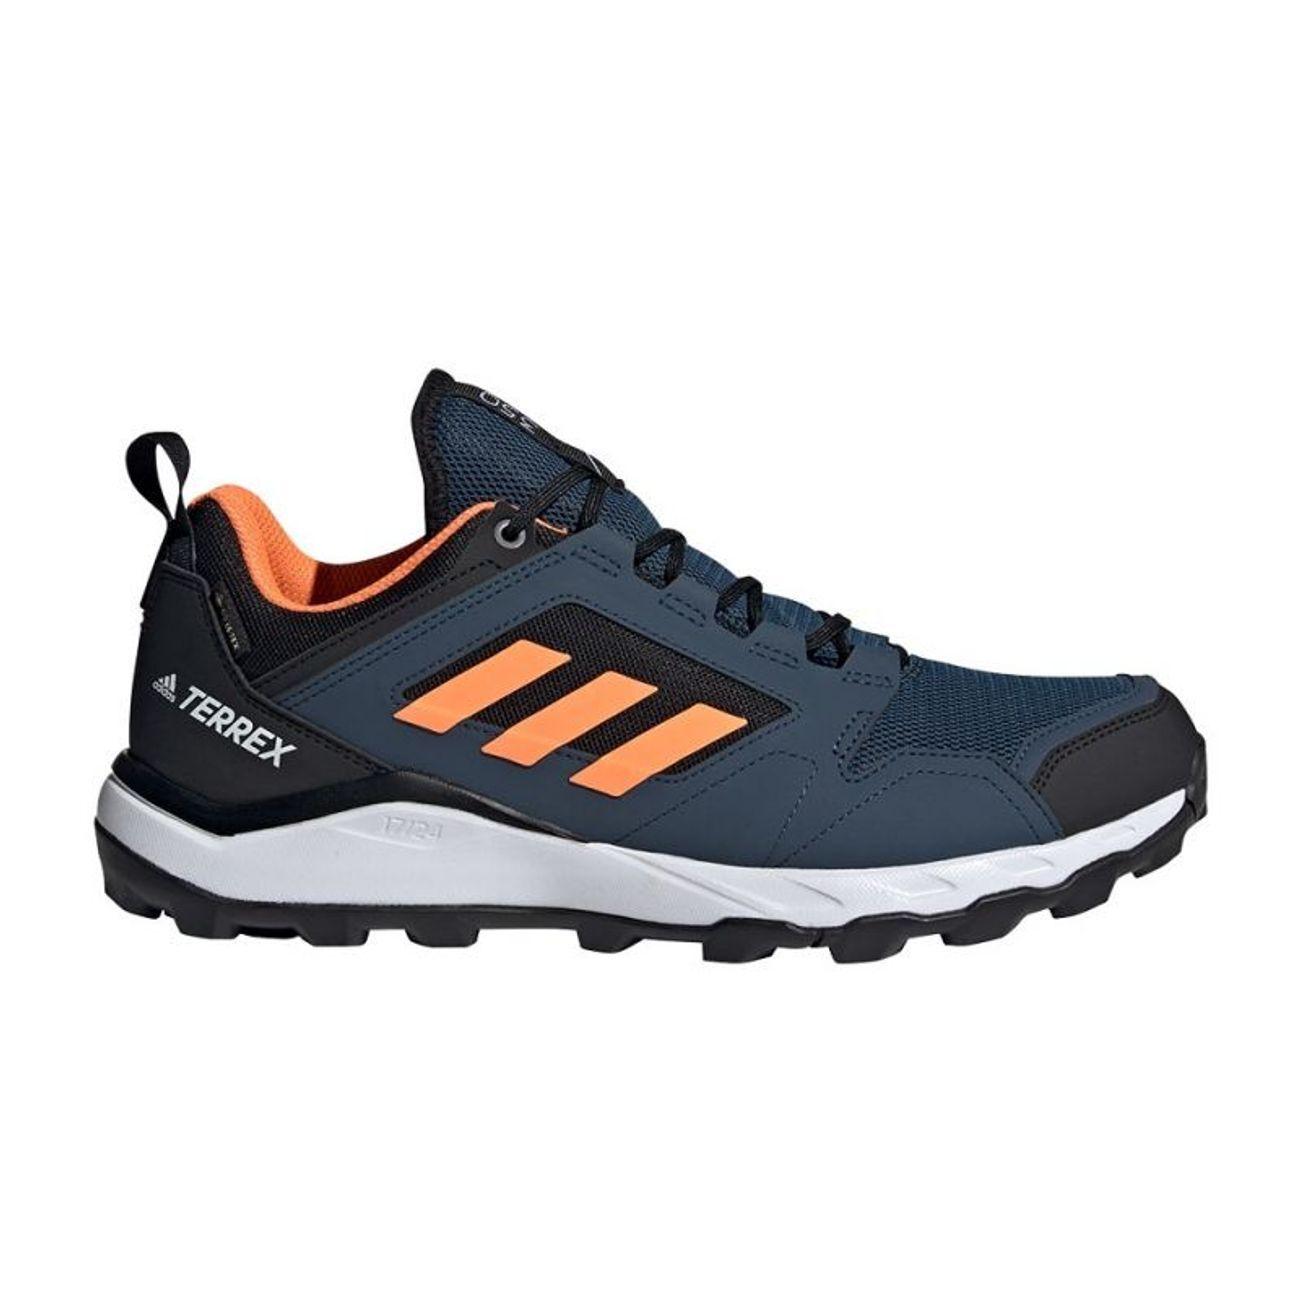 Course à pied homme ADIDAS Chaussures de trail adidas Terrex Agravic GORE-TEX